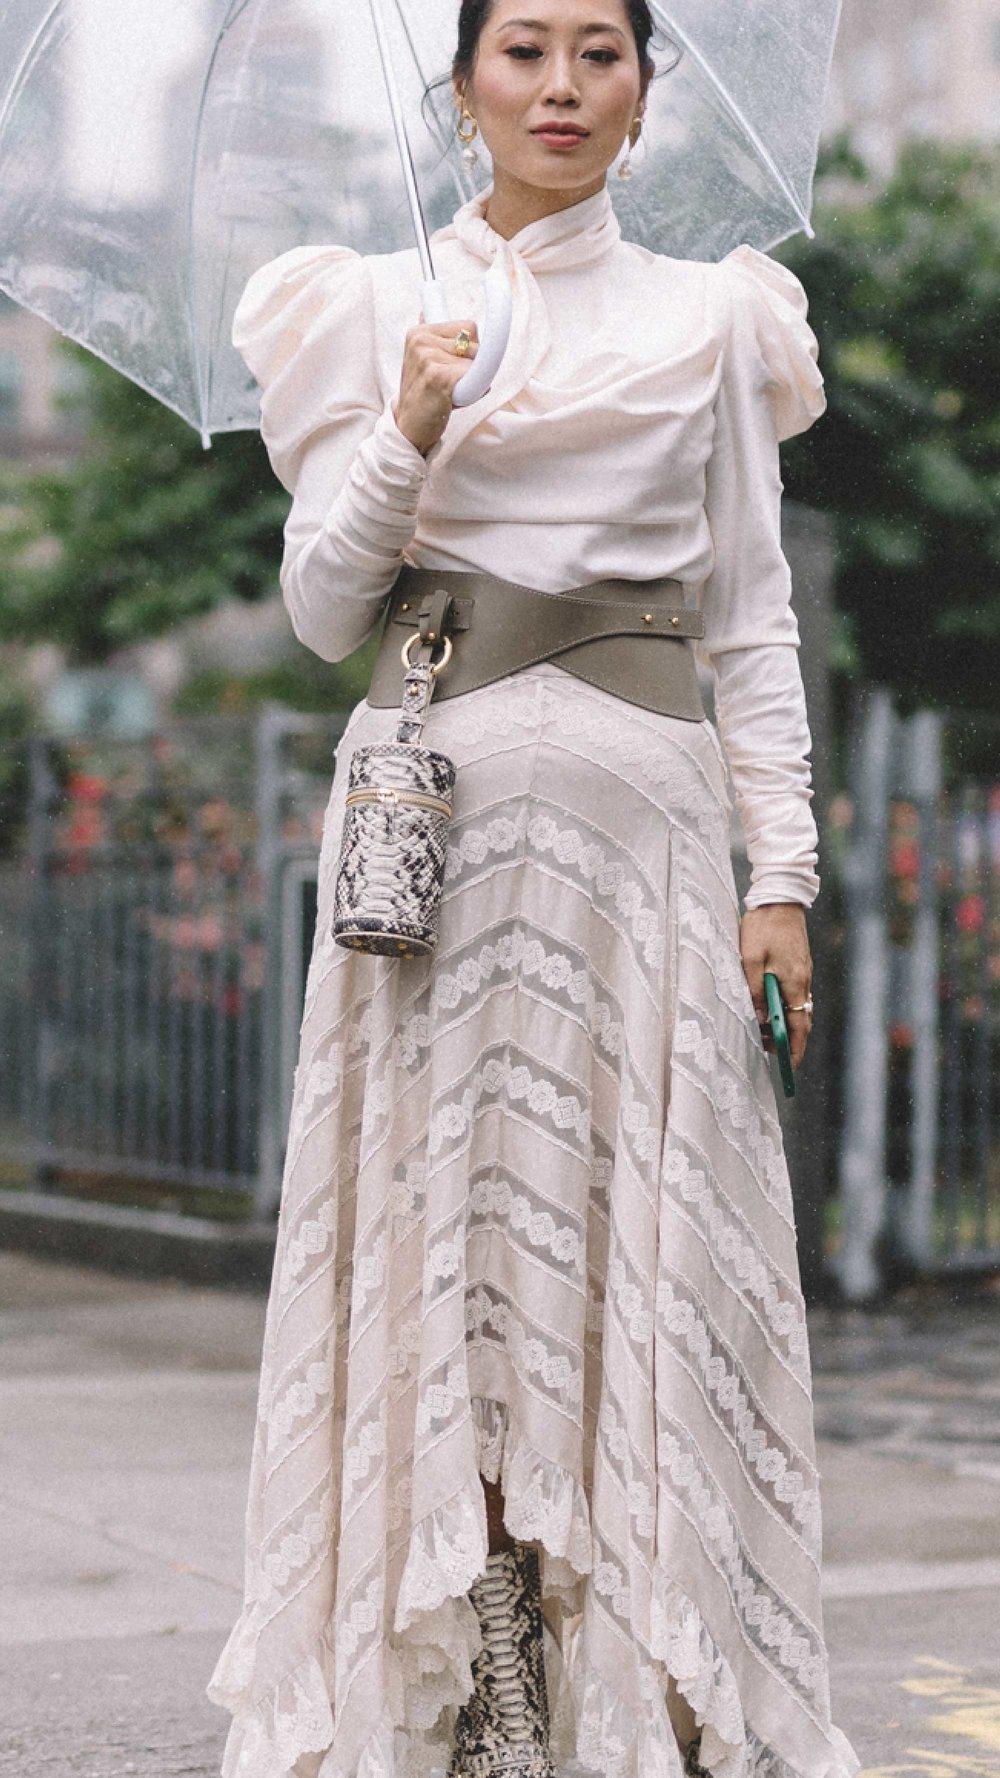 New-York-Fashion-Week-NYFW-SS18-street-style-day-five-SS1831.jpg